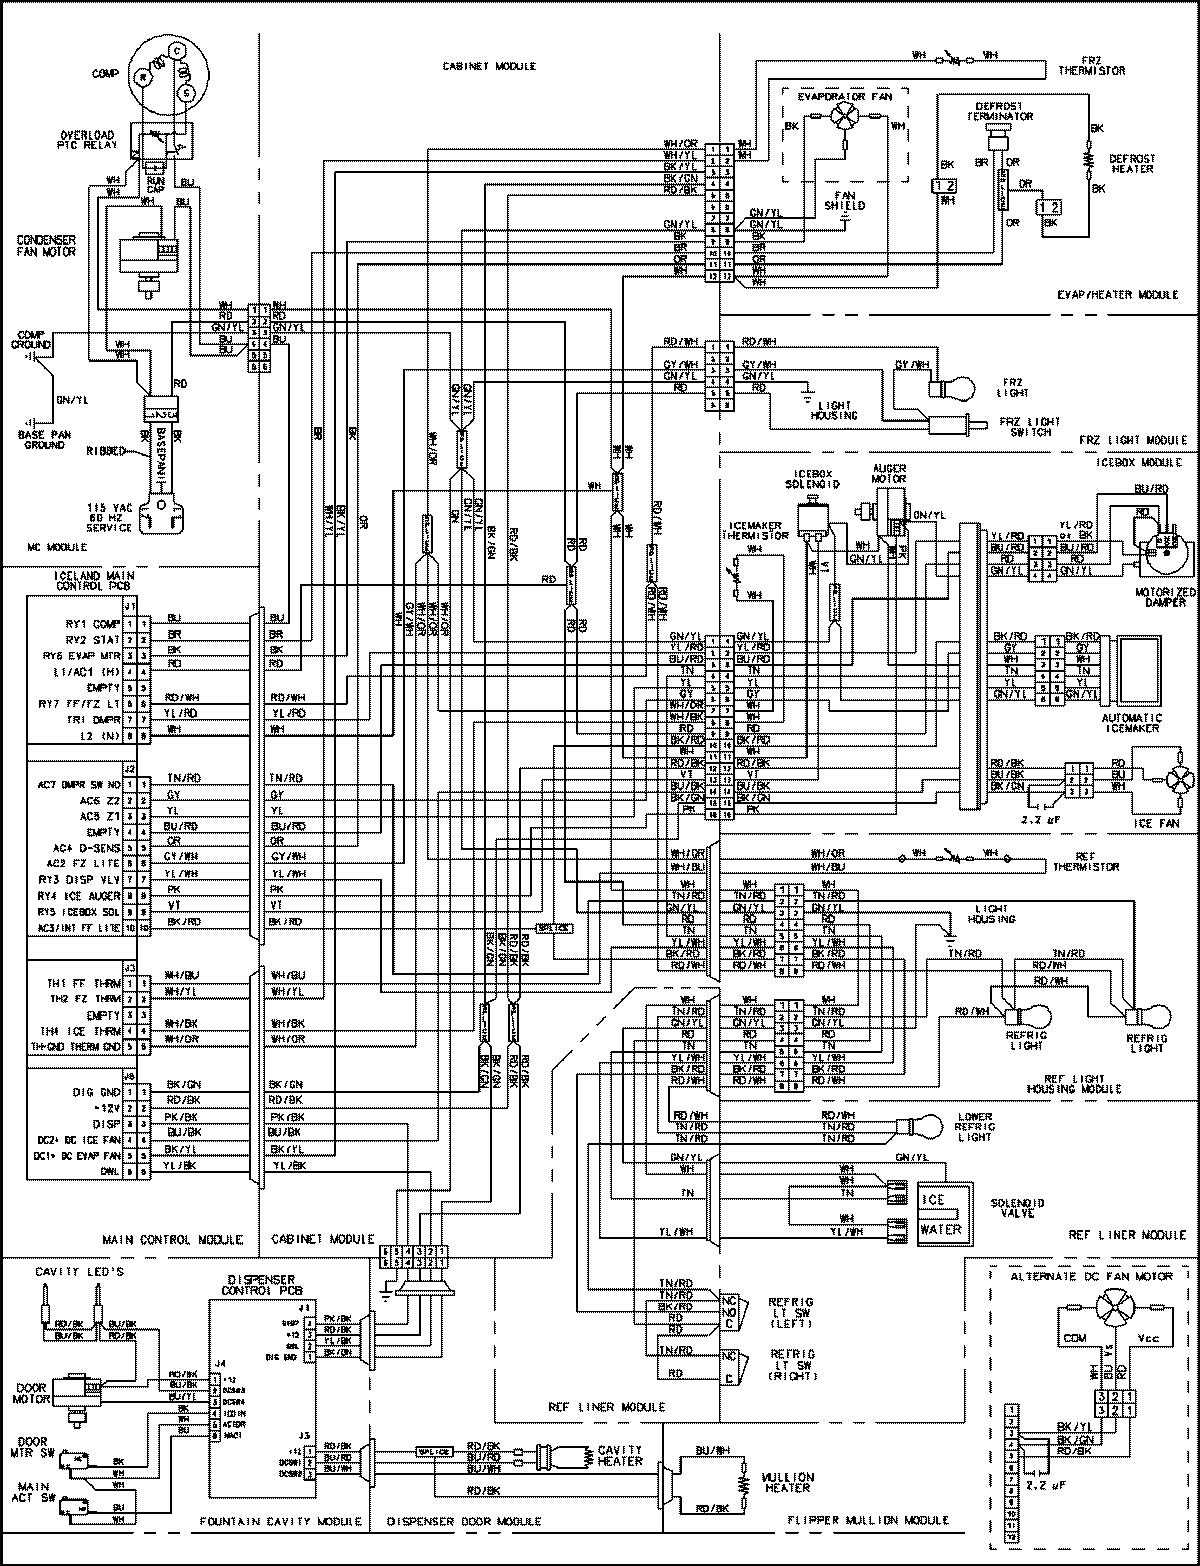 hight resolution of ge range ra620 wiring diagram wiring library rh 76 bloxhuette de ge range wiring diagramjgbs23bea2ad ge